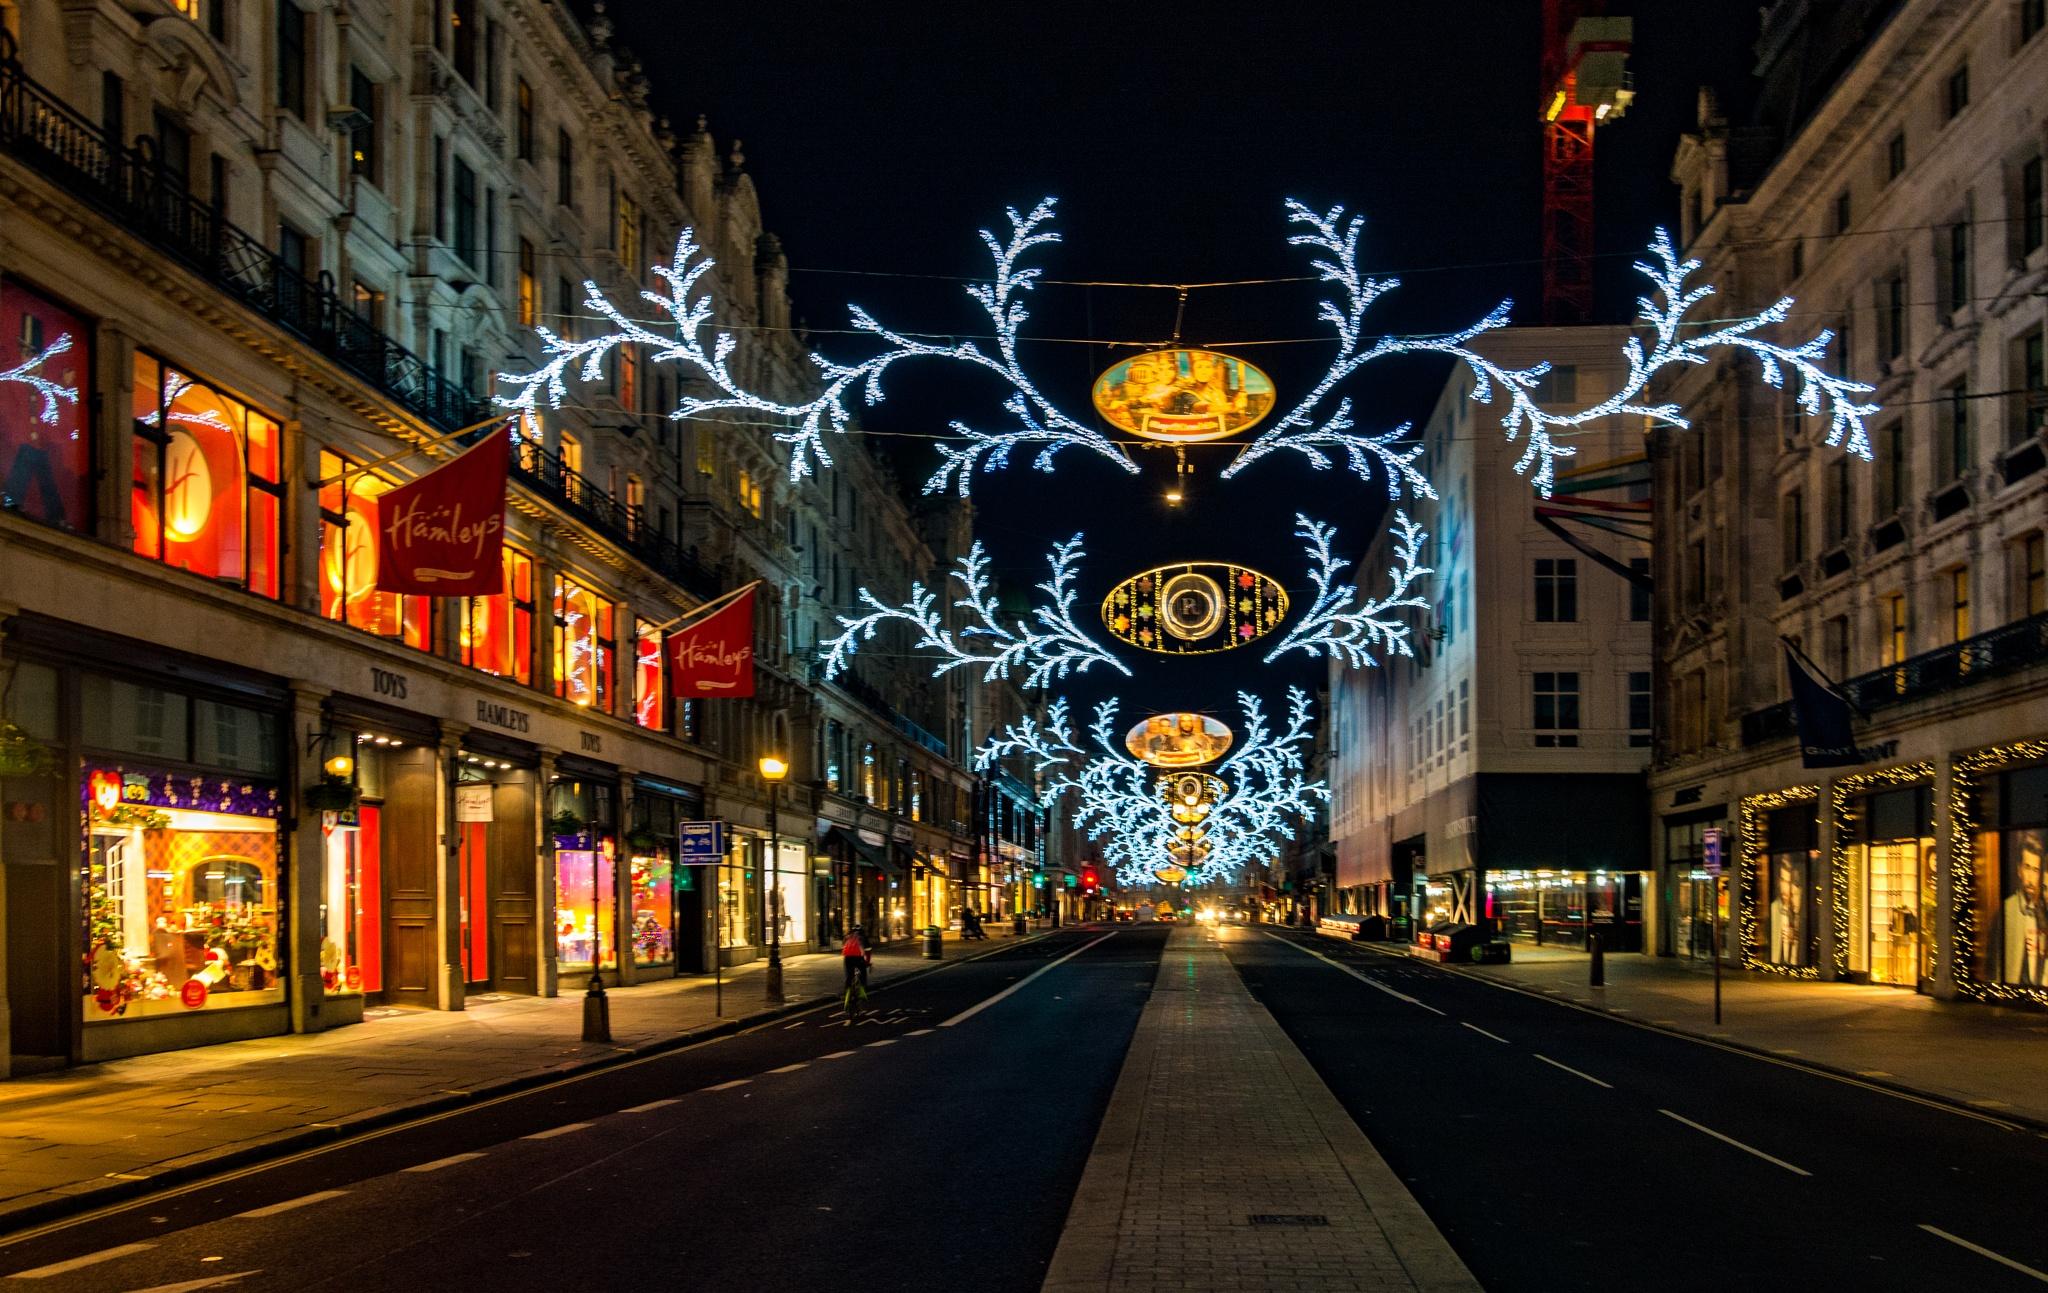 Christmas lights by Poetsoftheheart